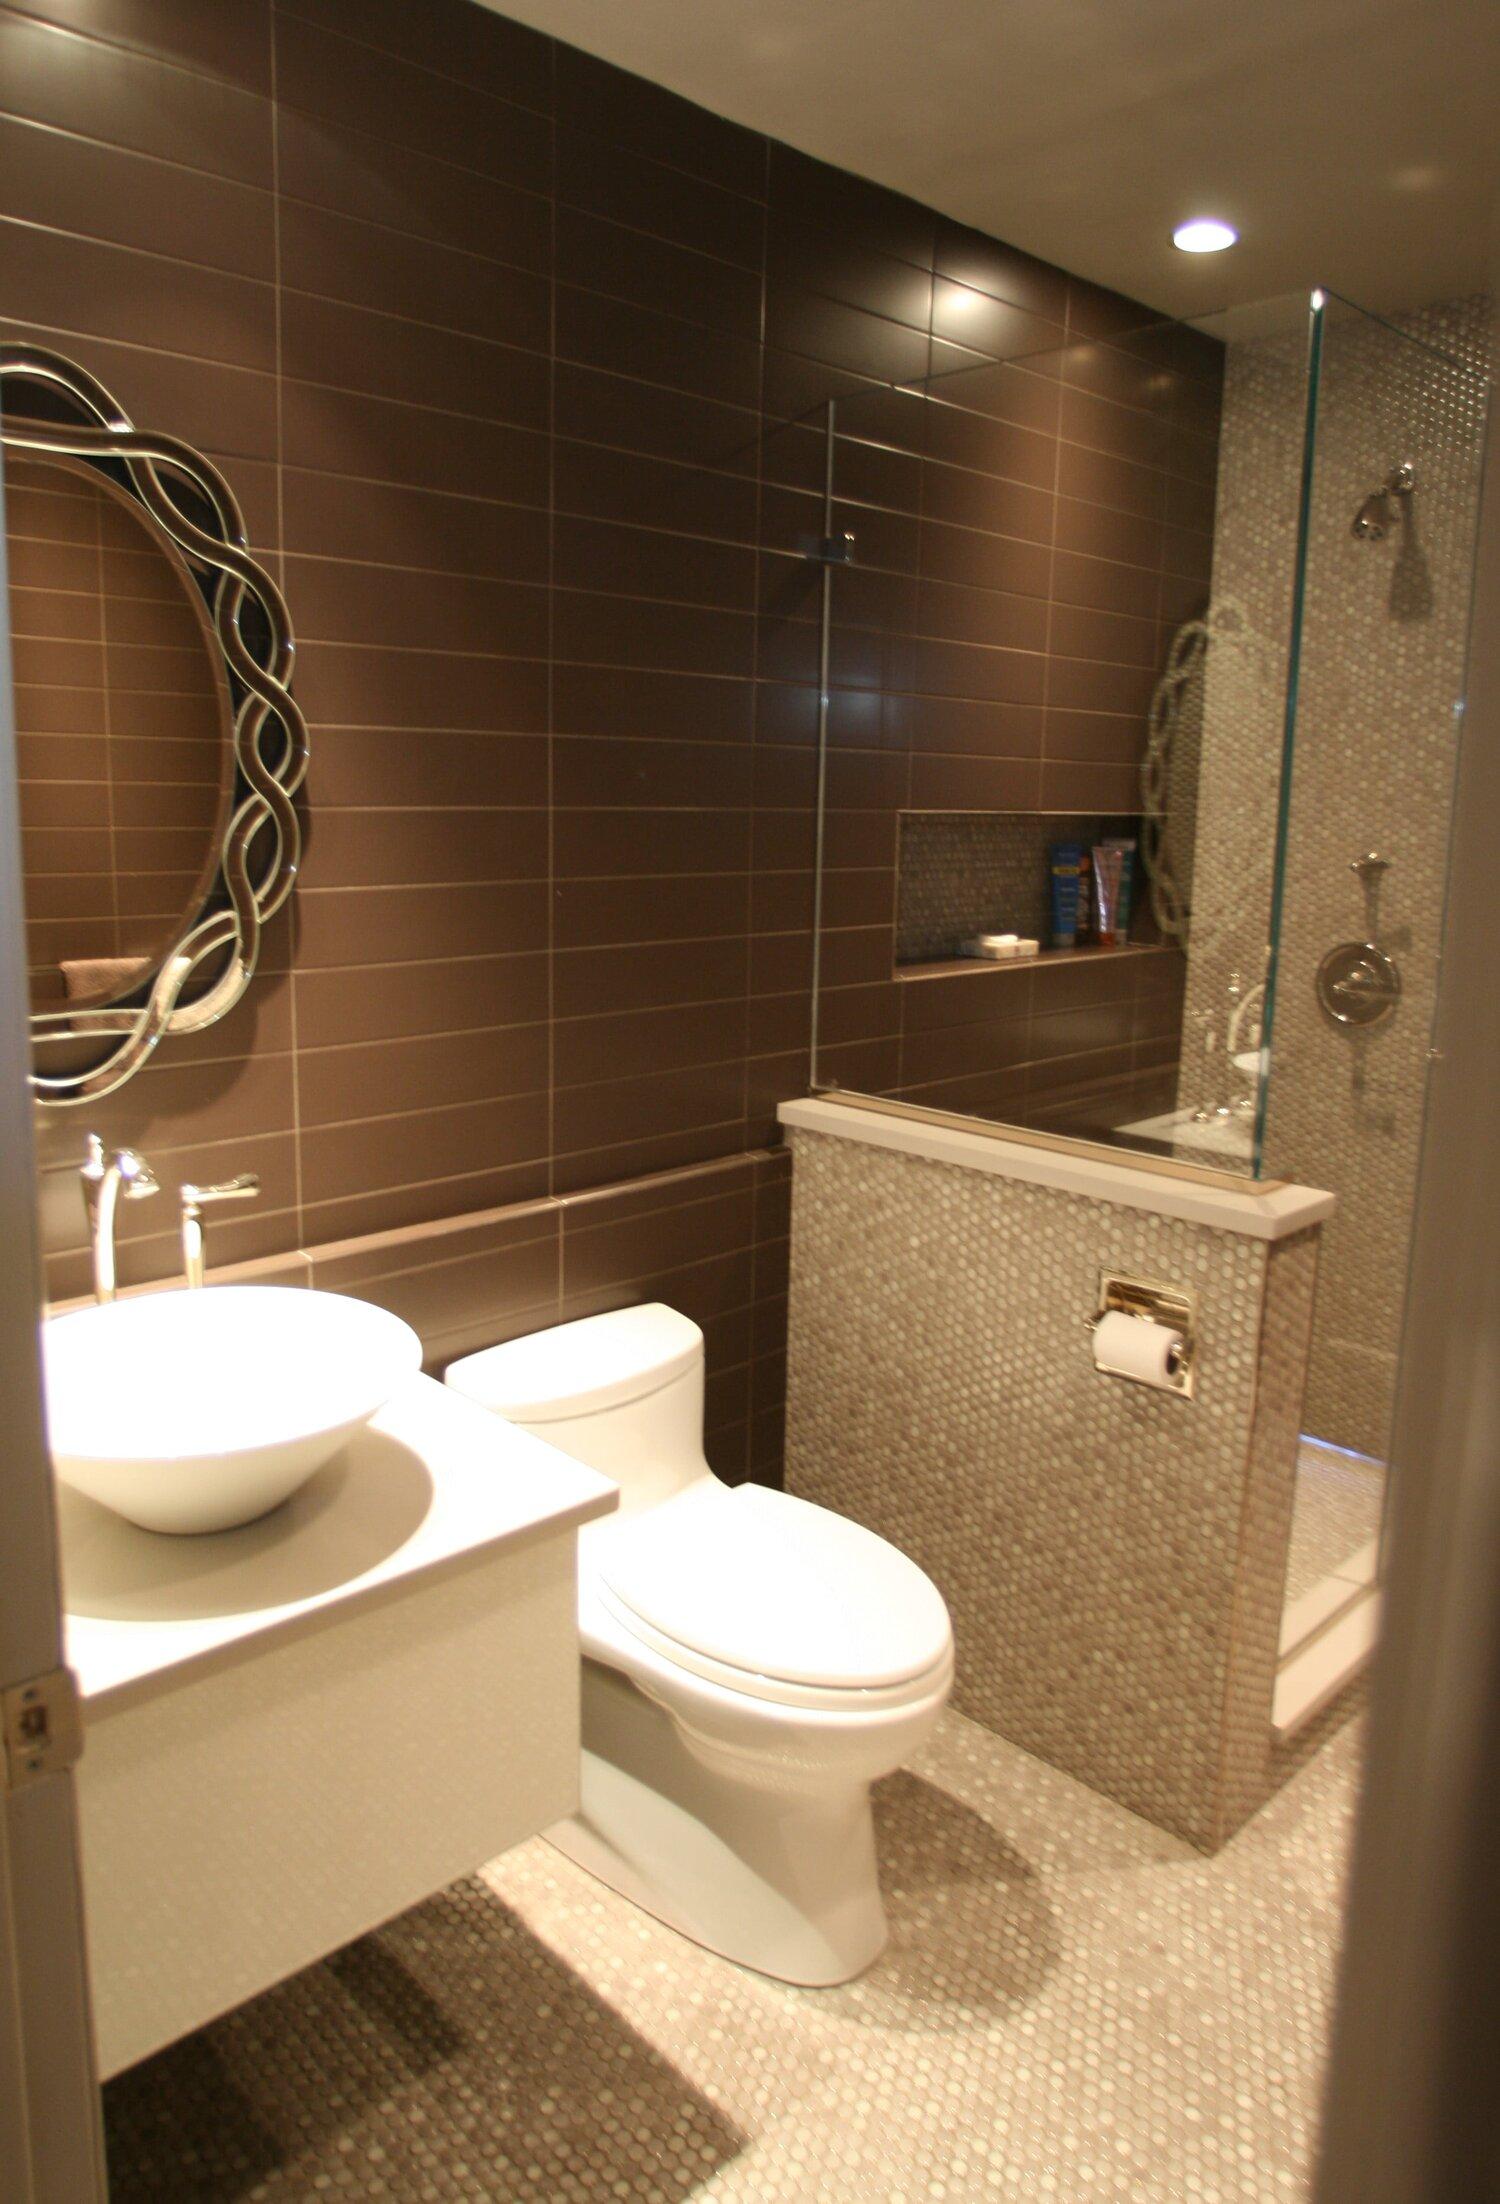 Warm Stone Pebble Bathroom Remodel And Interior Designer Sample Maplewood Nj Lm Design Lm Interior Design Interior Designer In Essex County Nj For Kitchen Bathroom And Whole House Remodeling 973 857 1561